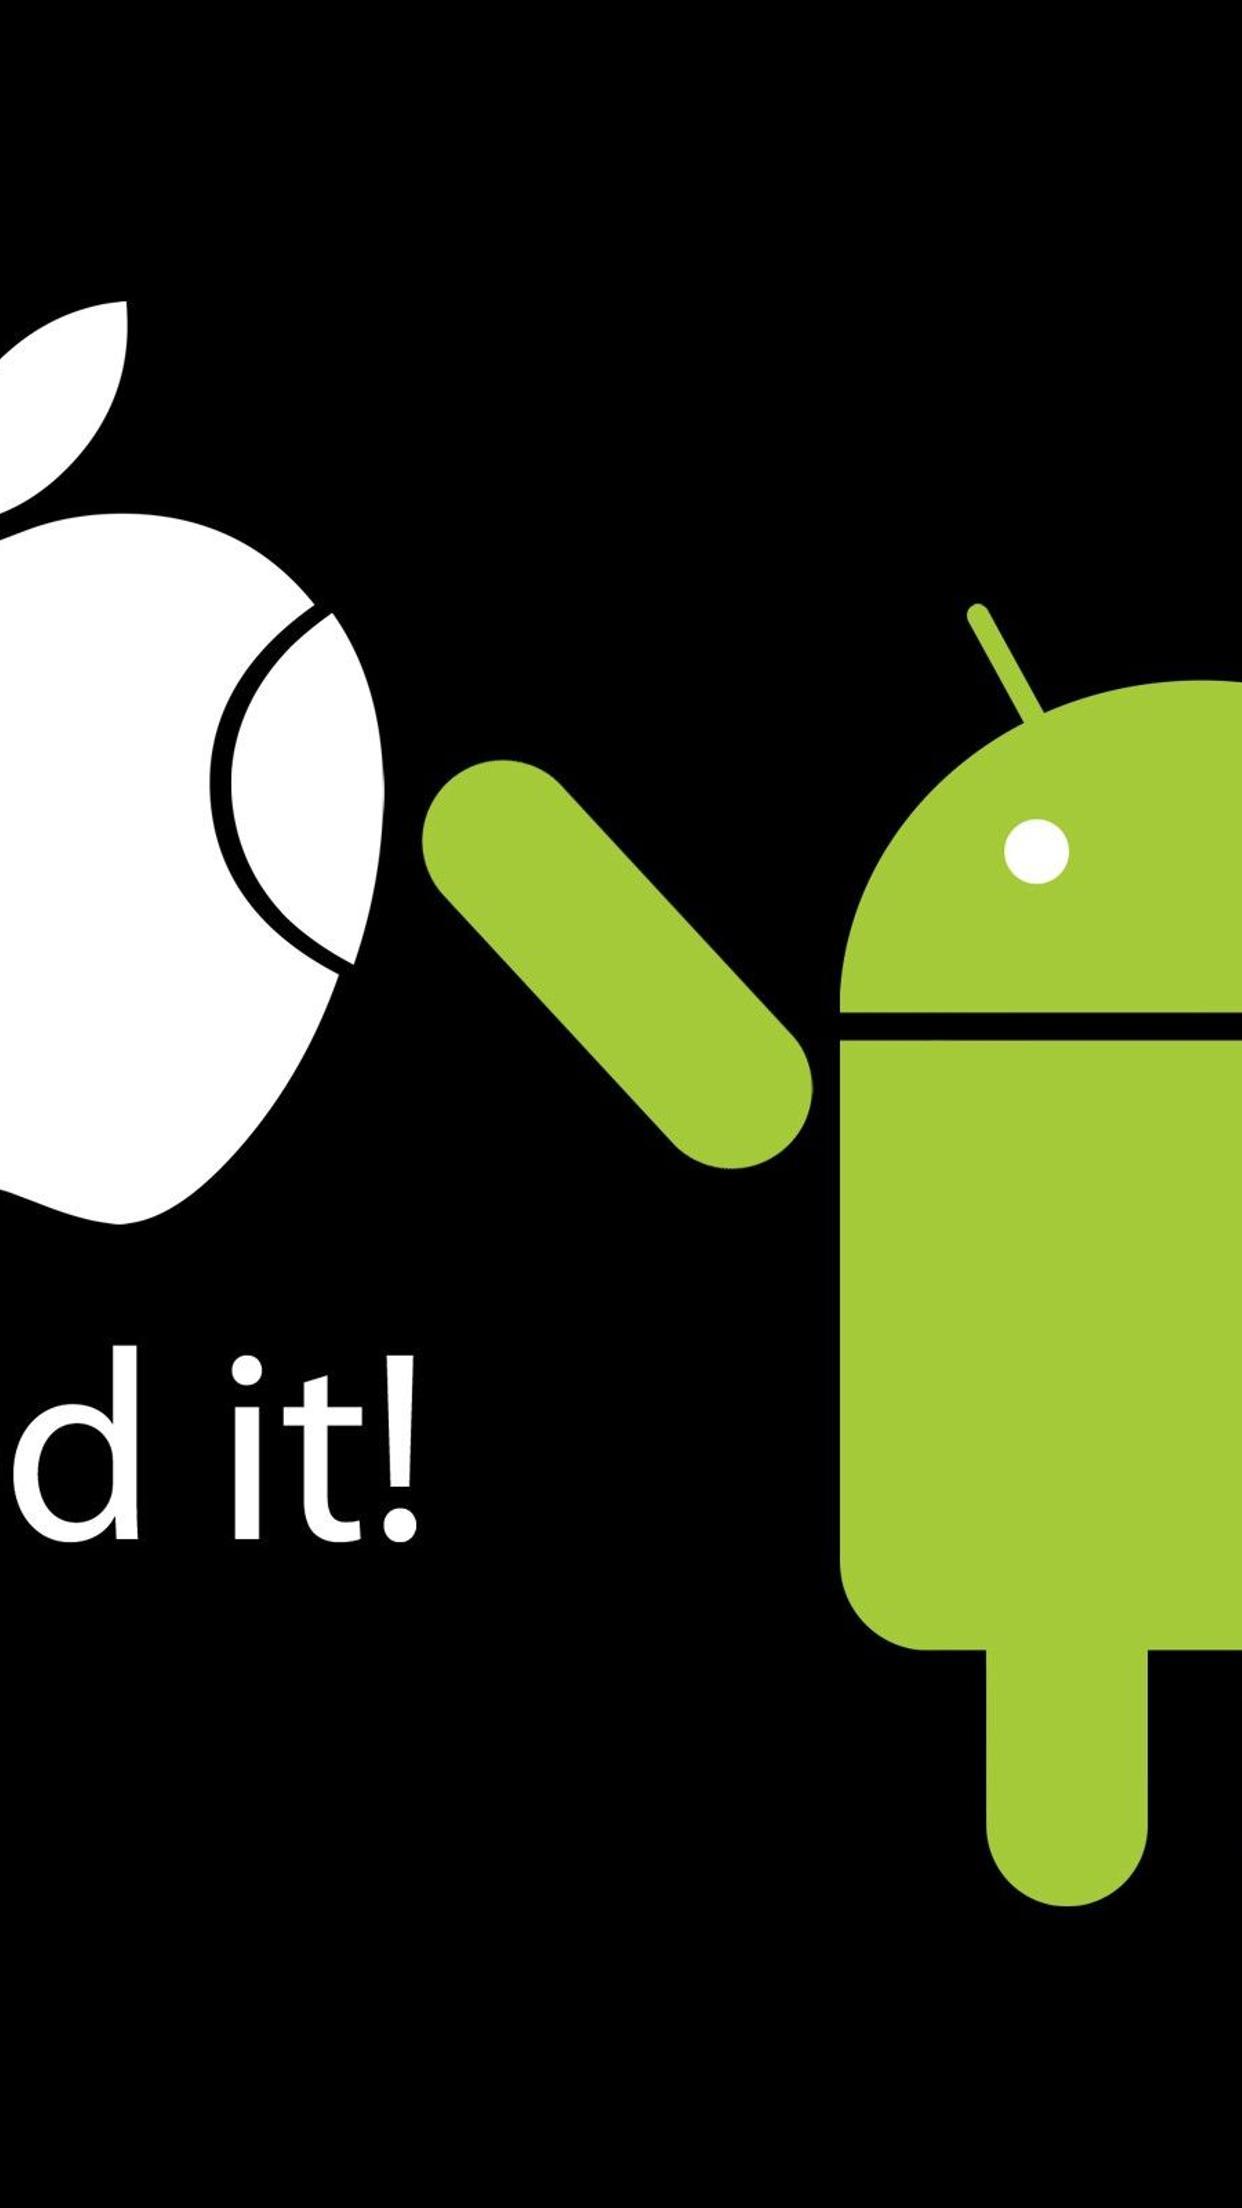 apple vs android - i fixed it - funny wallpaper wallpaper download